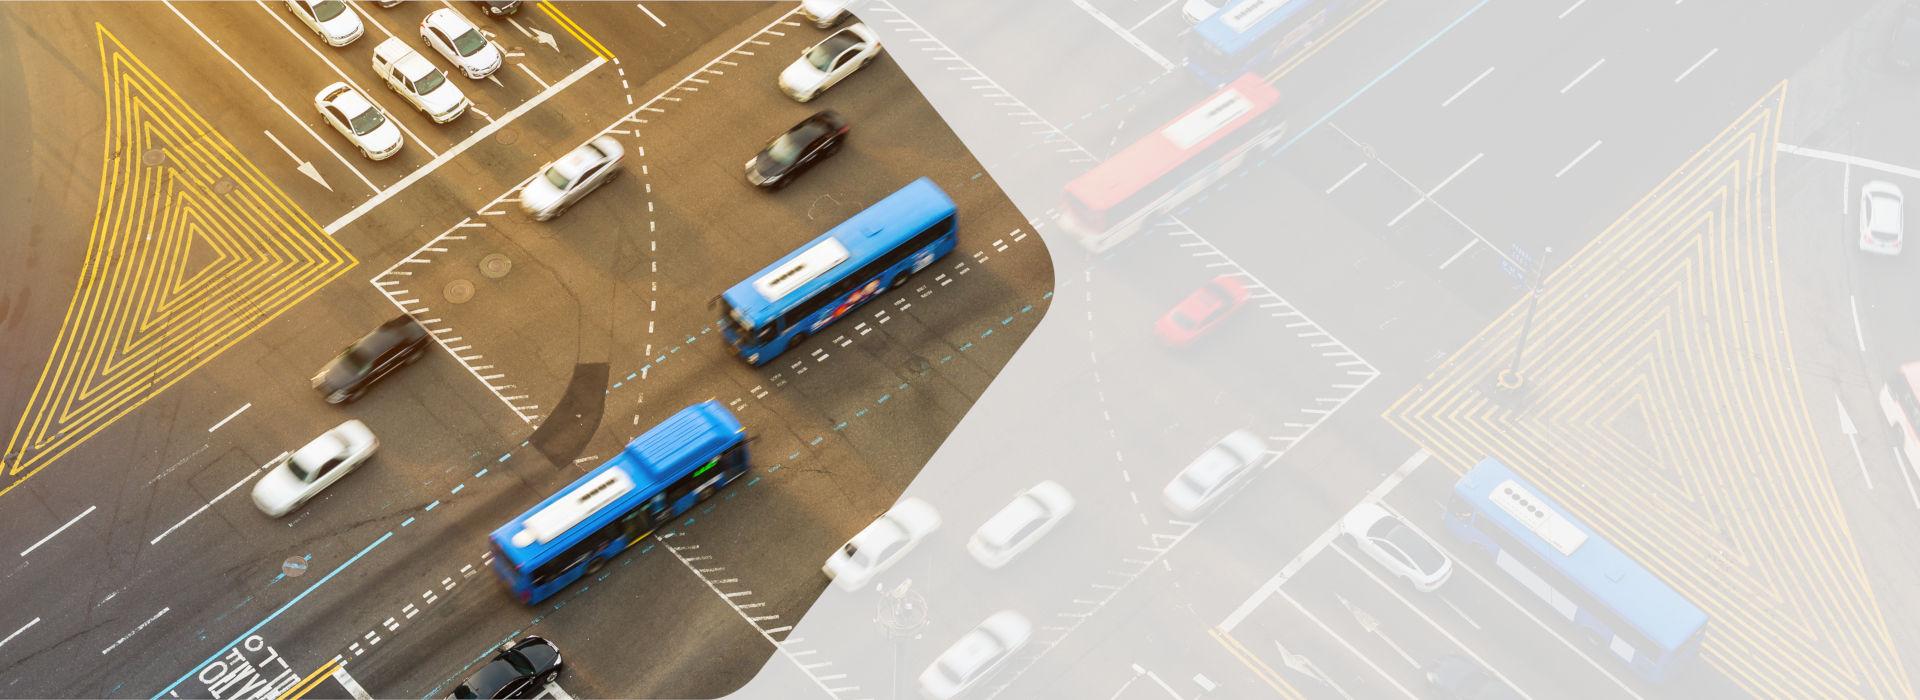 Trafikkontroll og overvåking